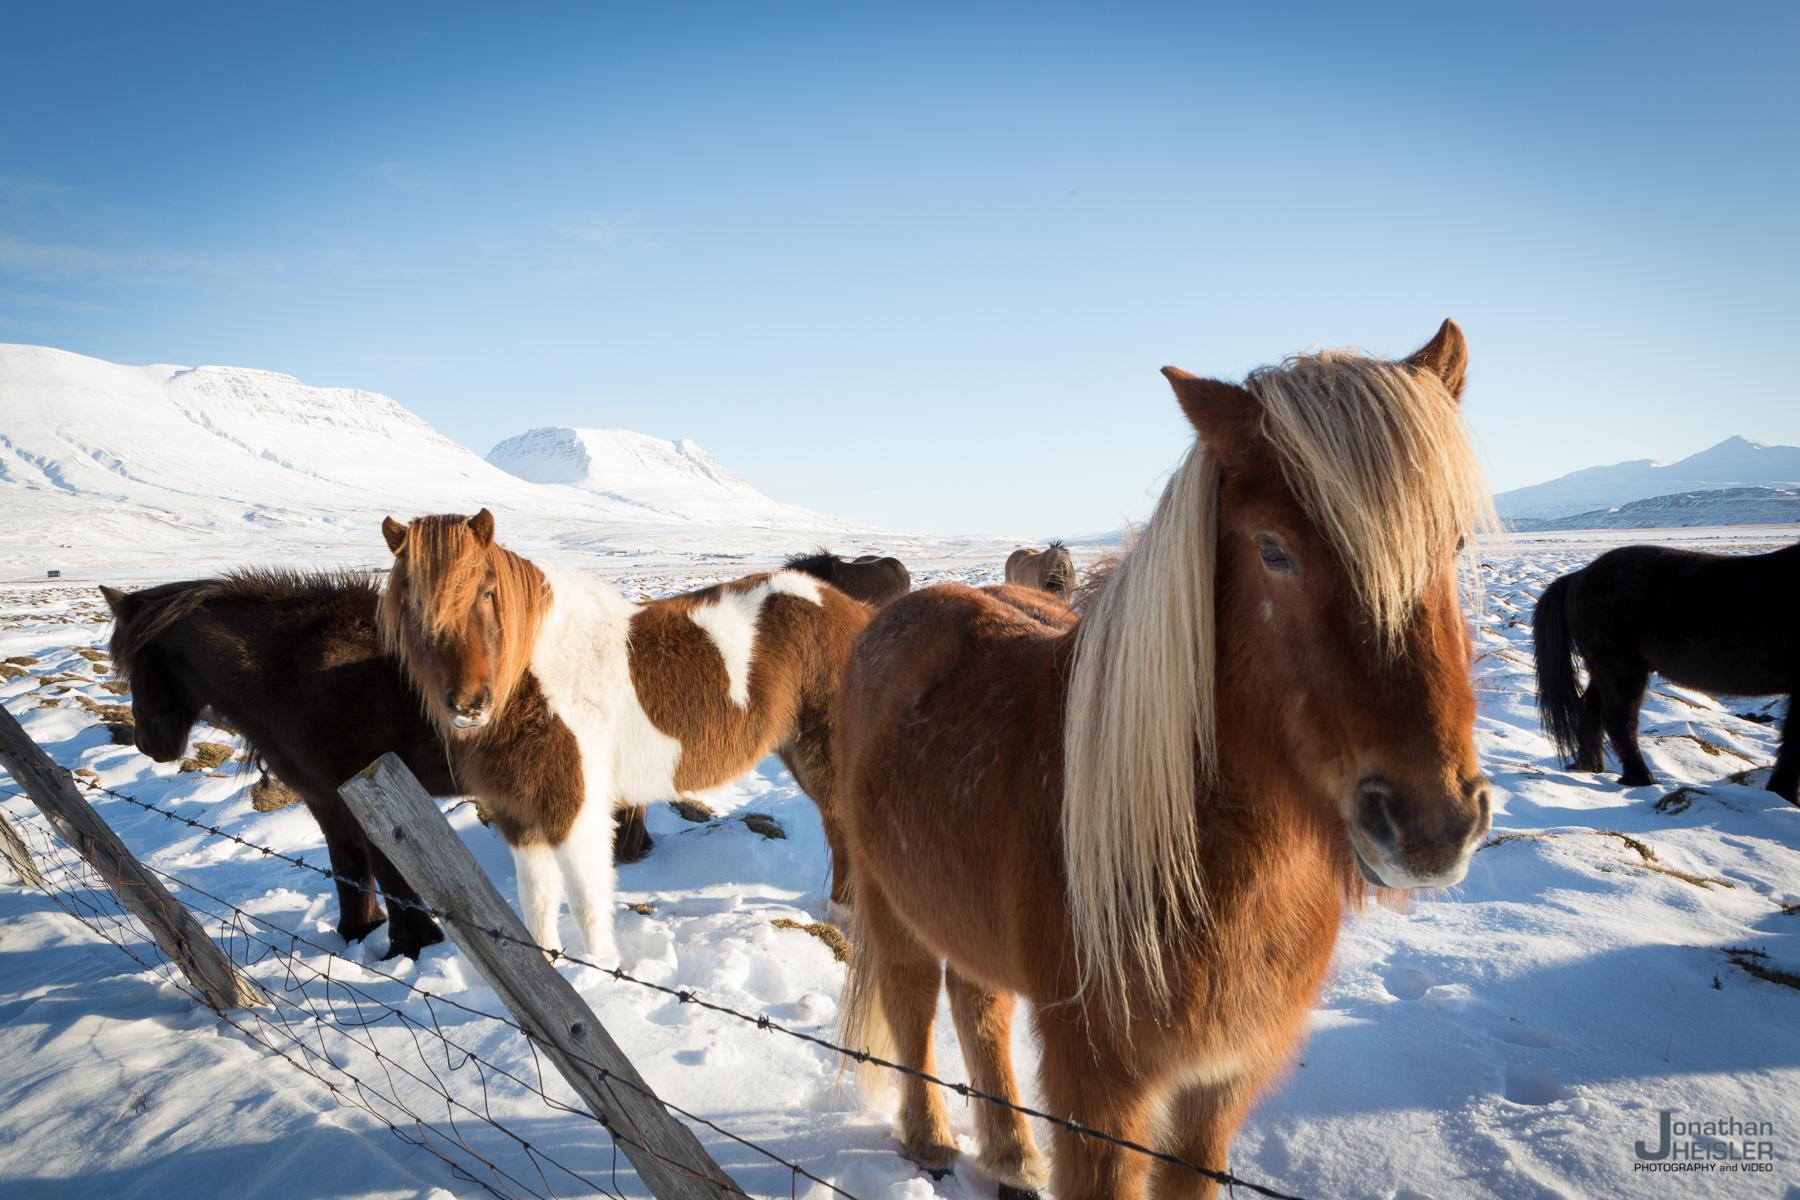 Iceland Winter Photos_  Jonathan Heisler __  02292016 _ 056.jpg